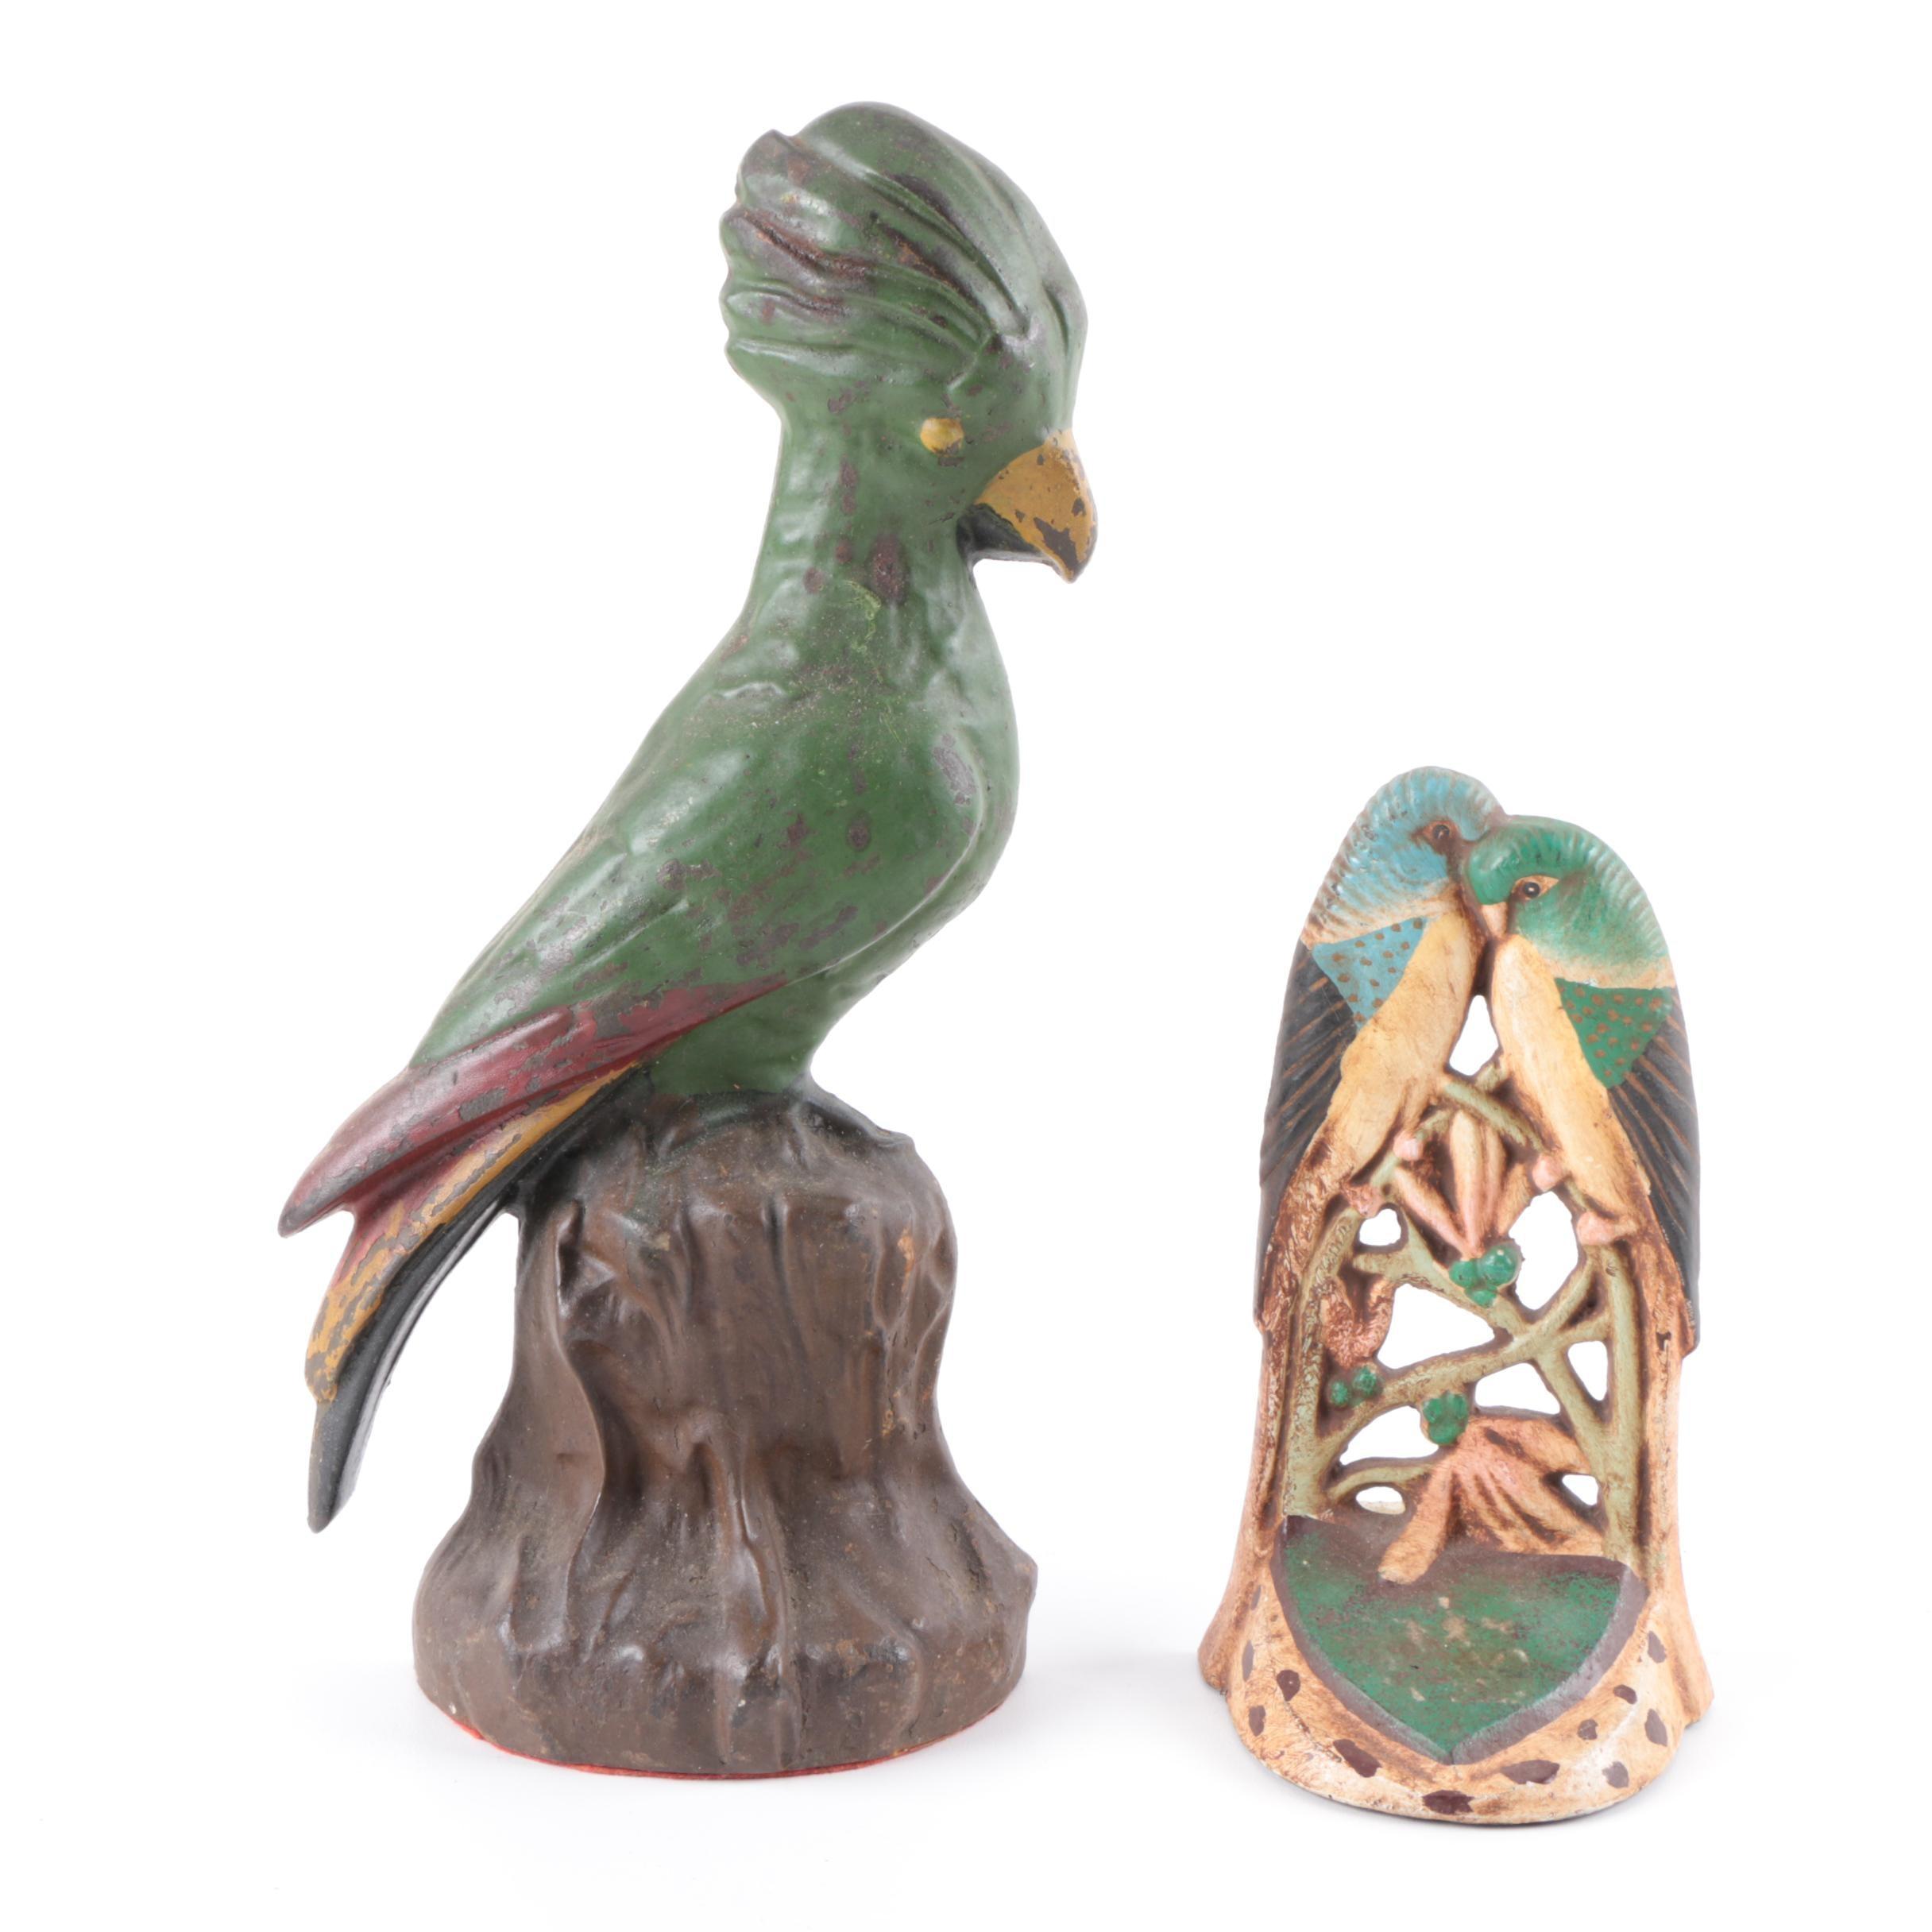 Antique Cast Iron Parakeet and Kingfisher Door Stops